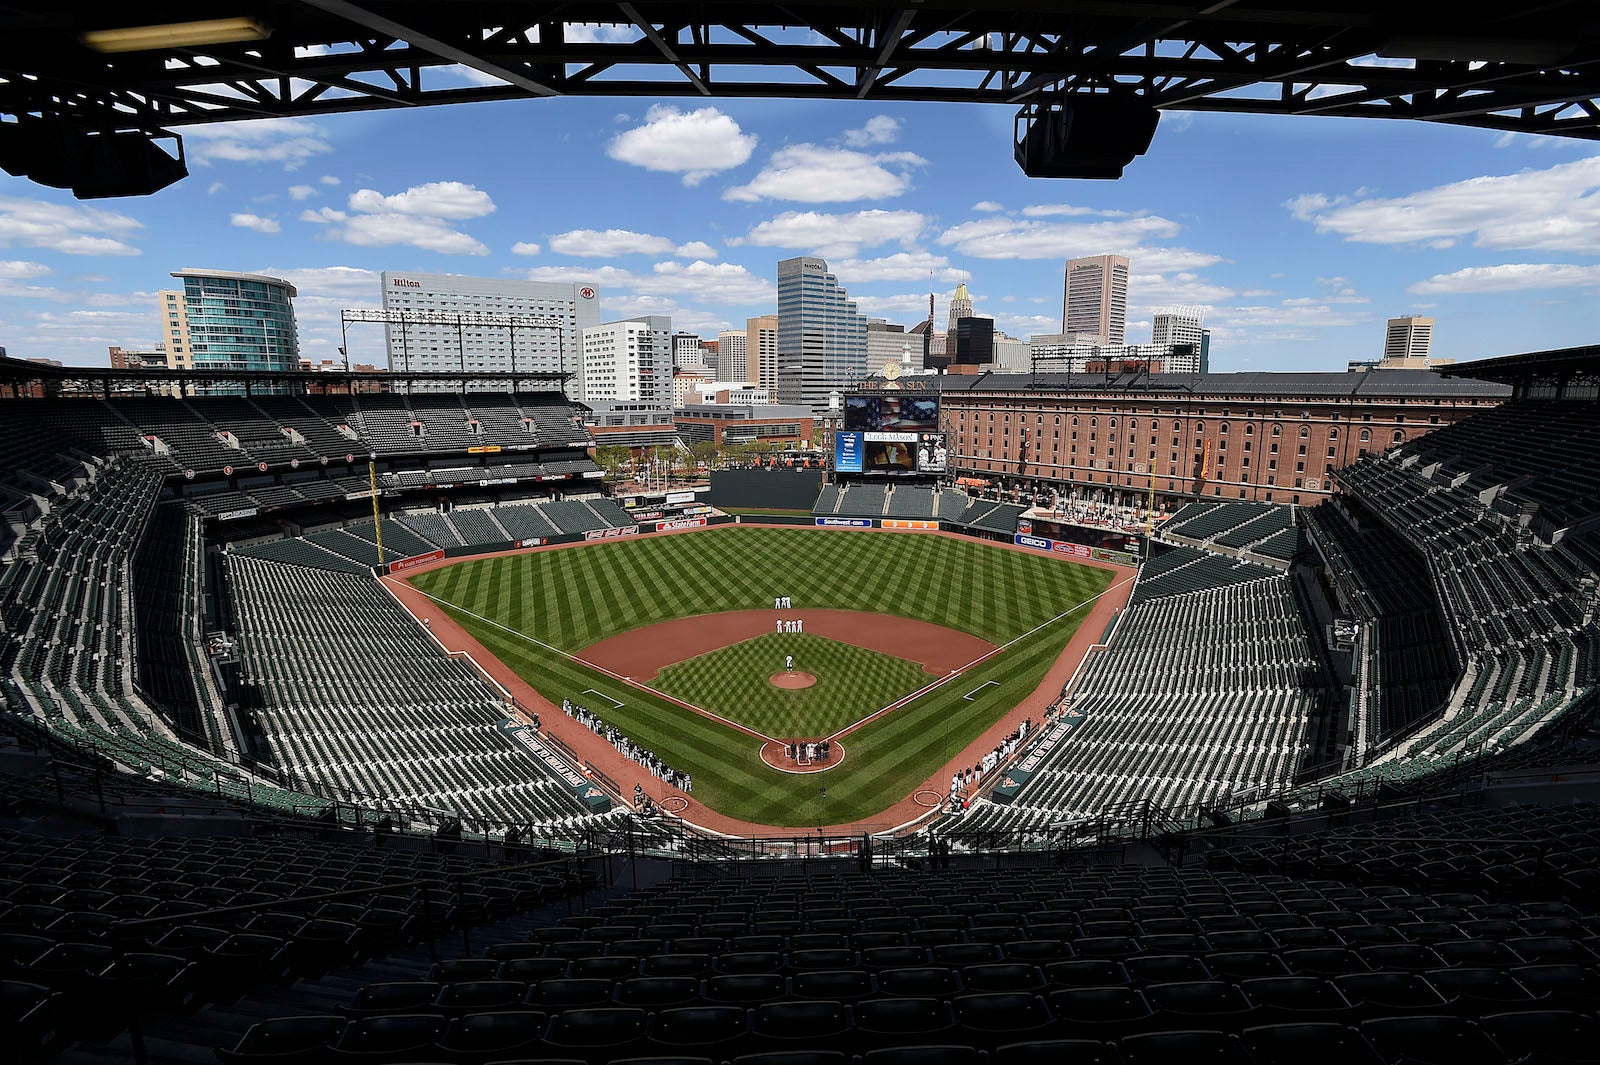 Photos An Empty Stadium Hosts Mlb Baseball Game Gizmodo